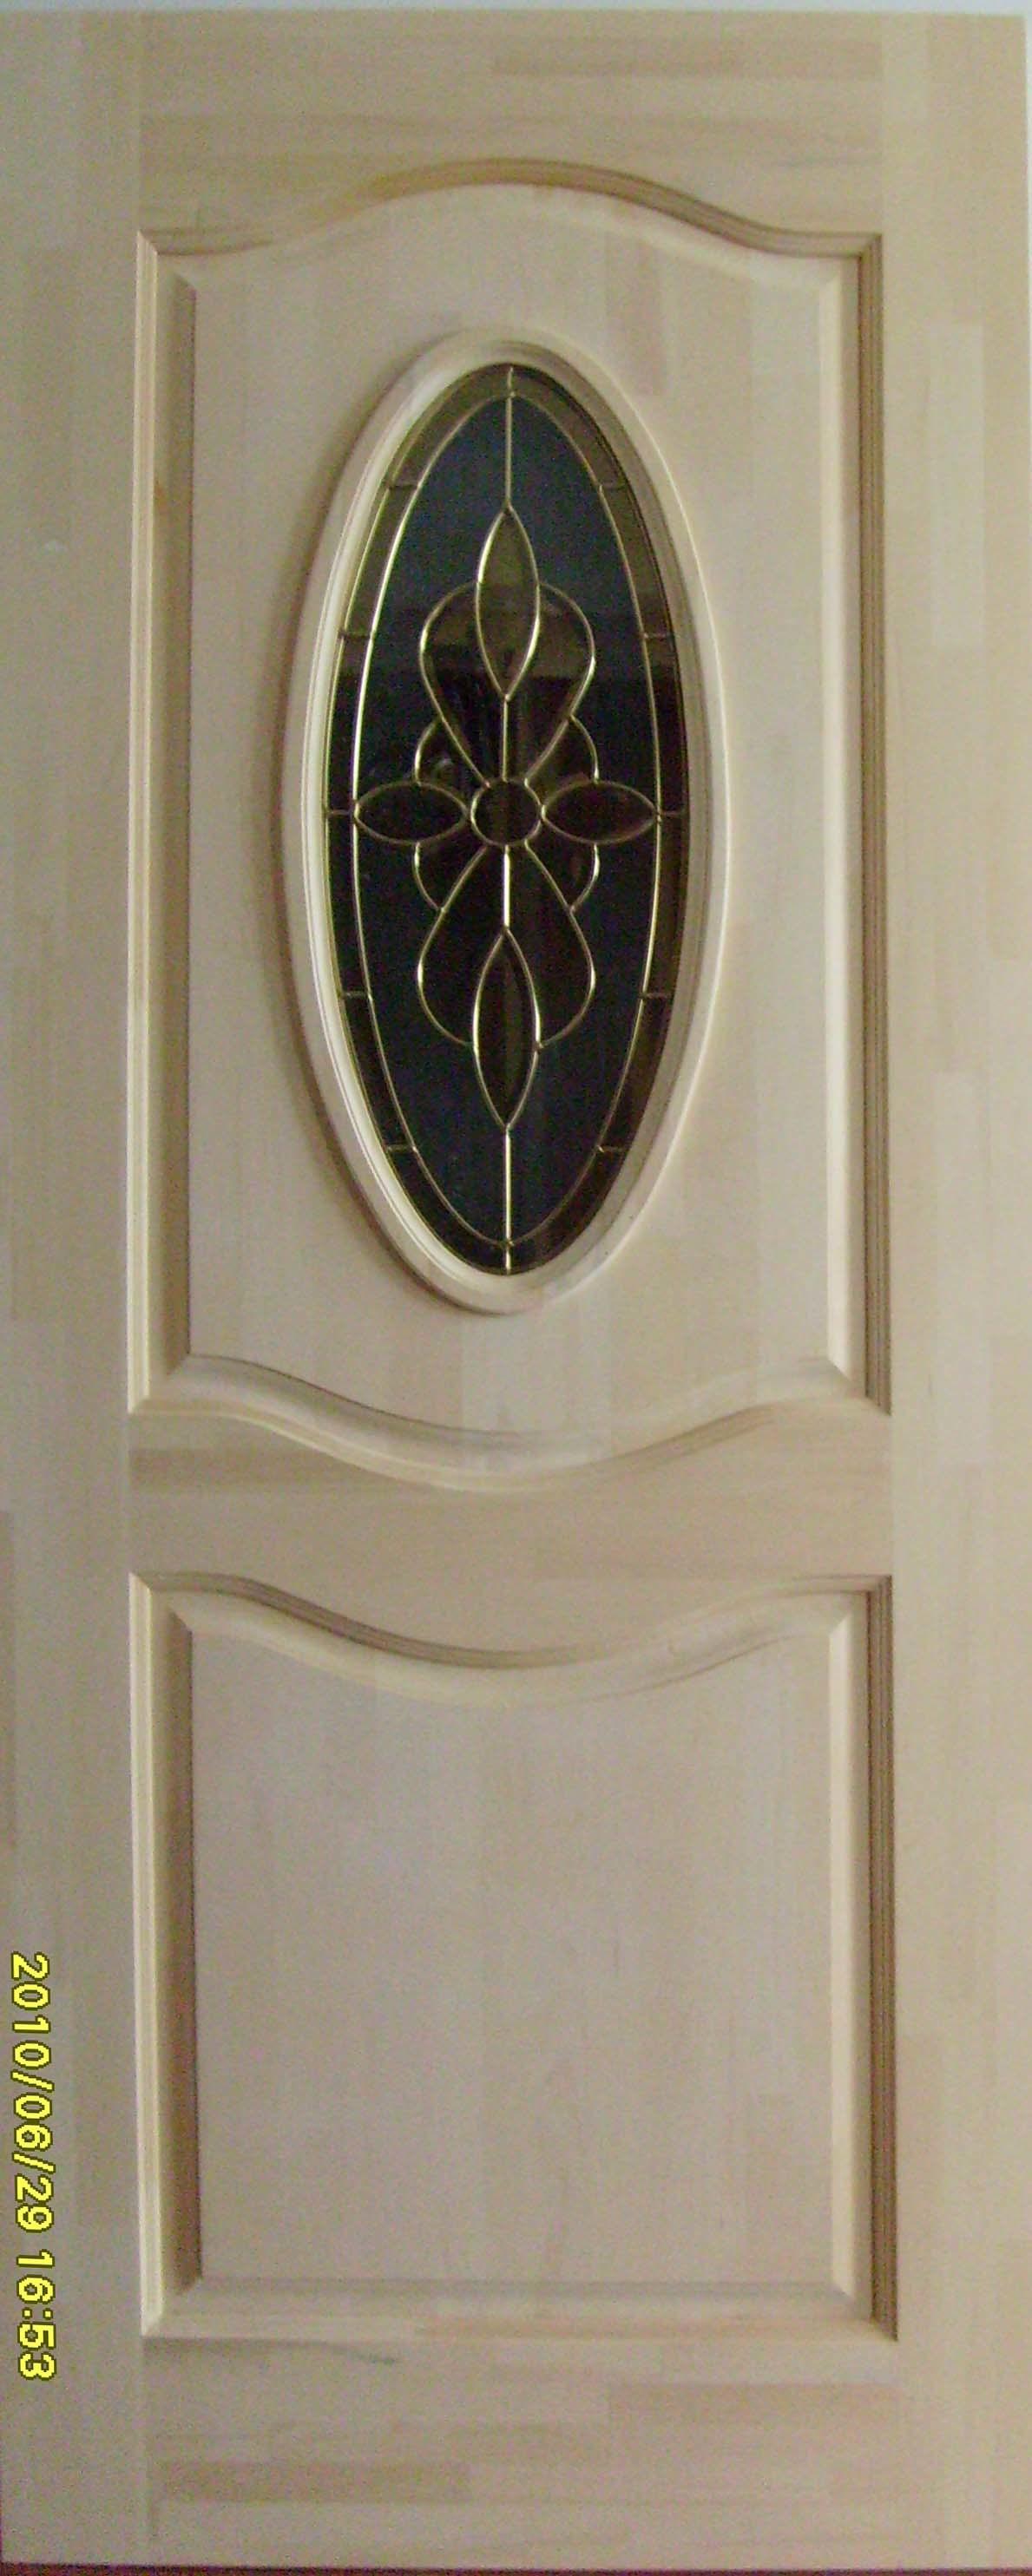 Solid Pine Wood Door with Beautiful Glass